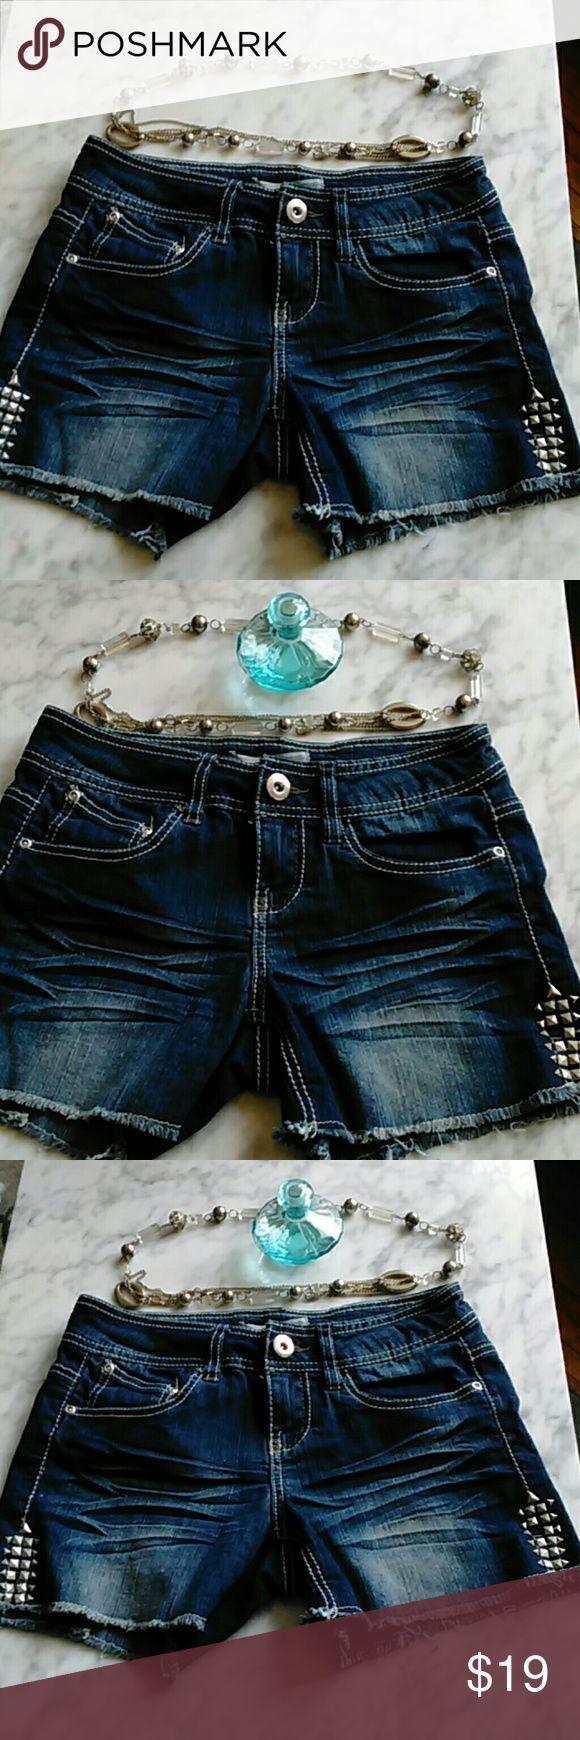 Selling this No Boundaries ladies Denim Shorts Size 3 in my Poshmark closet! My username is: mitzeclipse07. #shopmycloset #poshmark #fashion #shopping #style #forsale #No Boundaries #Pants